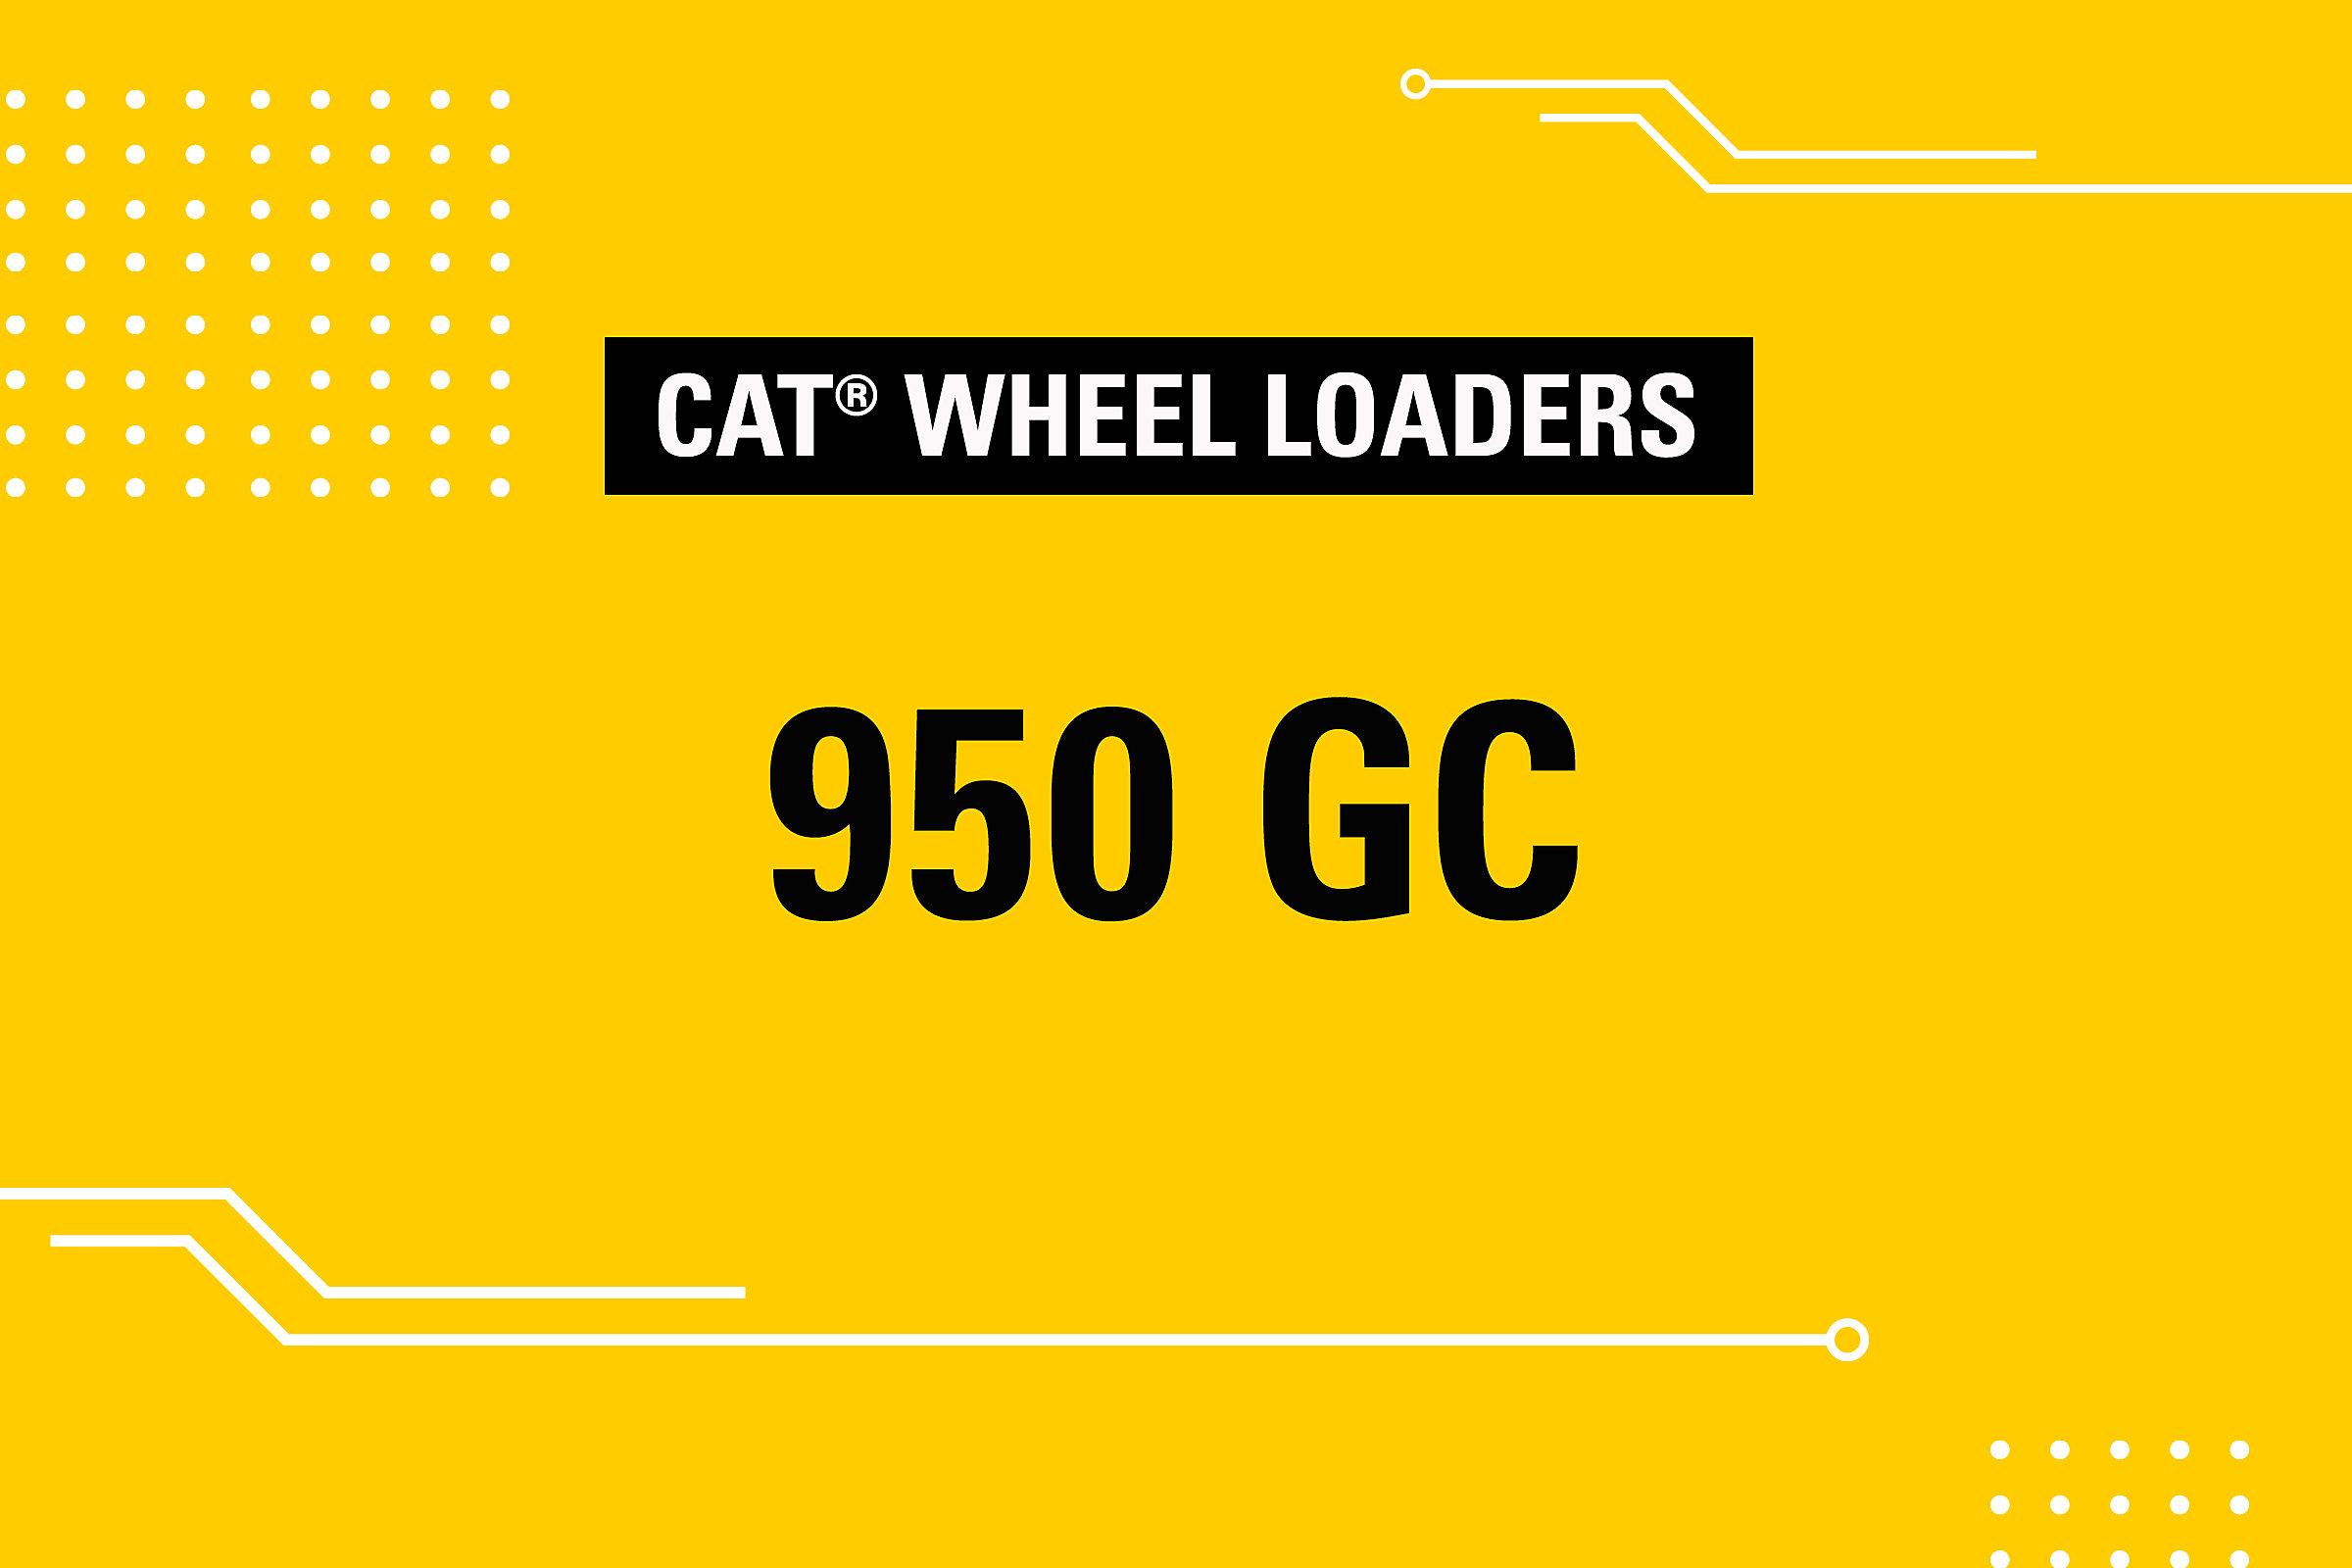 Wheel Loaders 950 GC